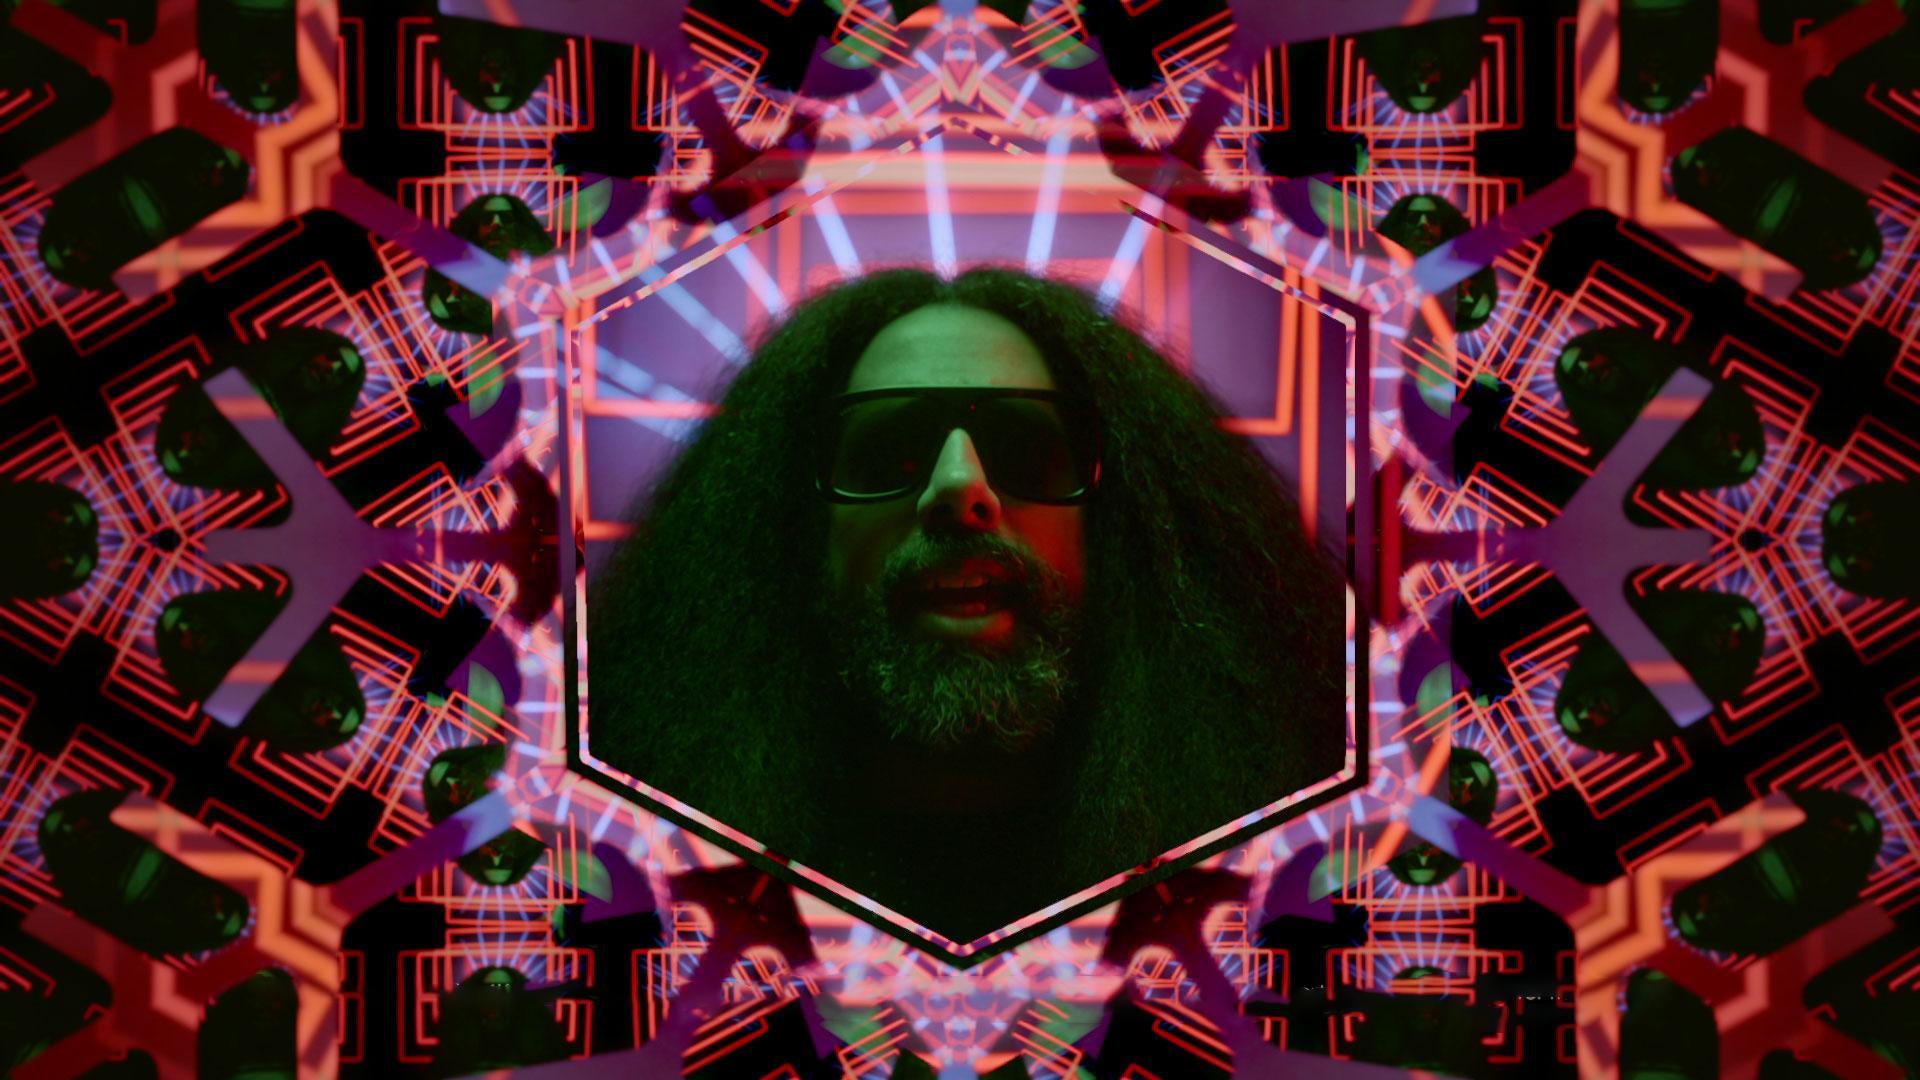 human face screenshot person text man glasses poster cartoon colorful